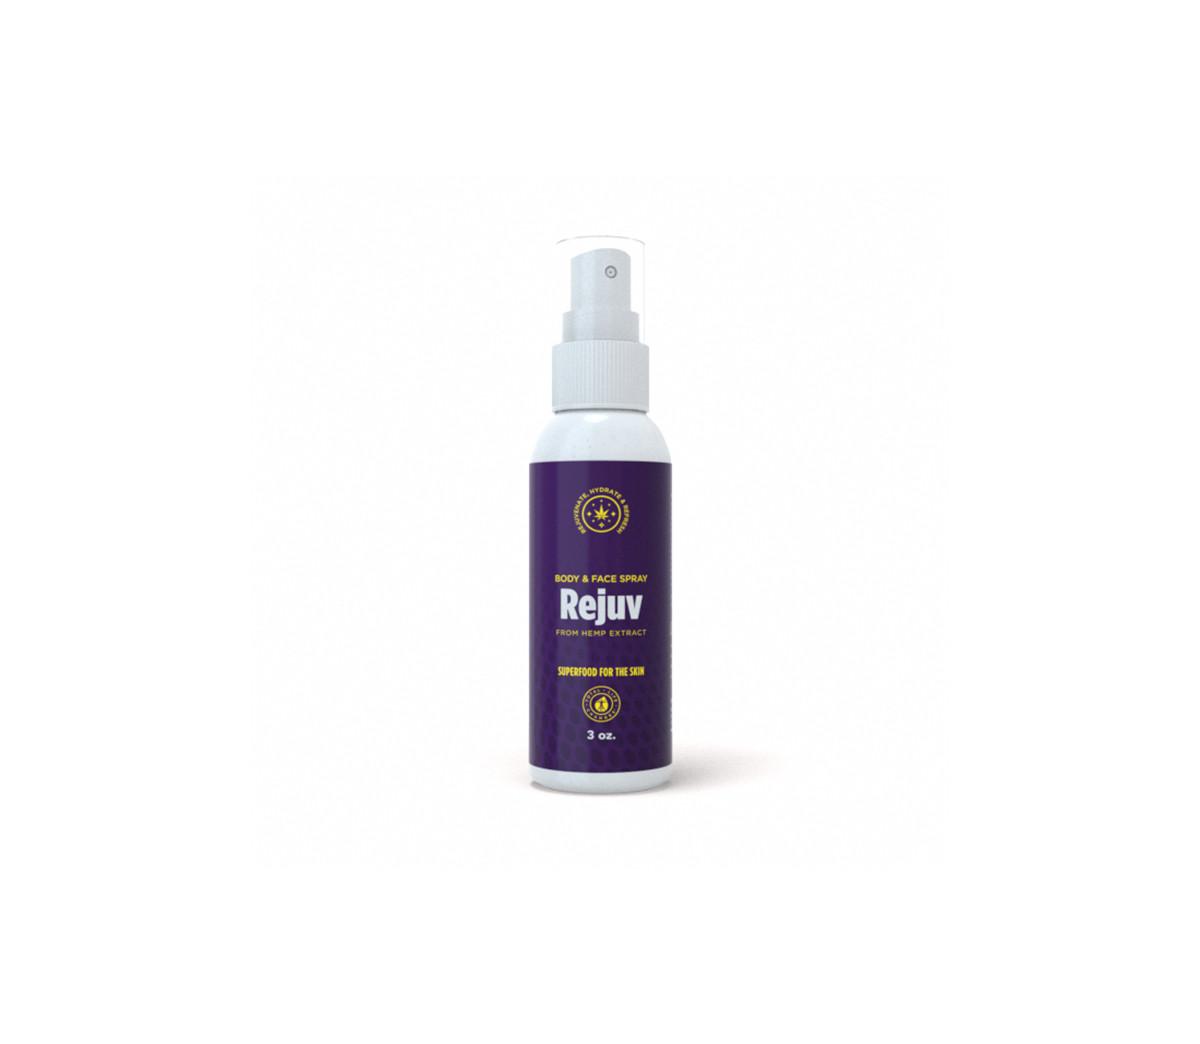 Rejuv Face & Body Spray